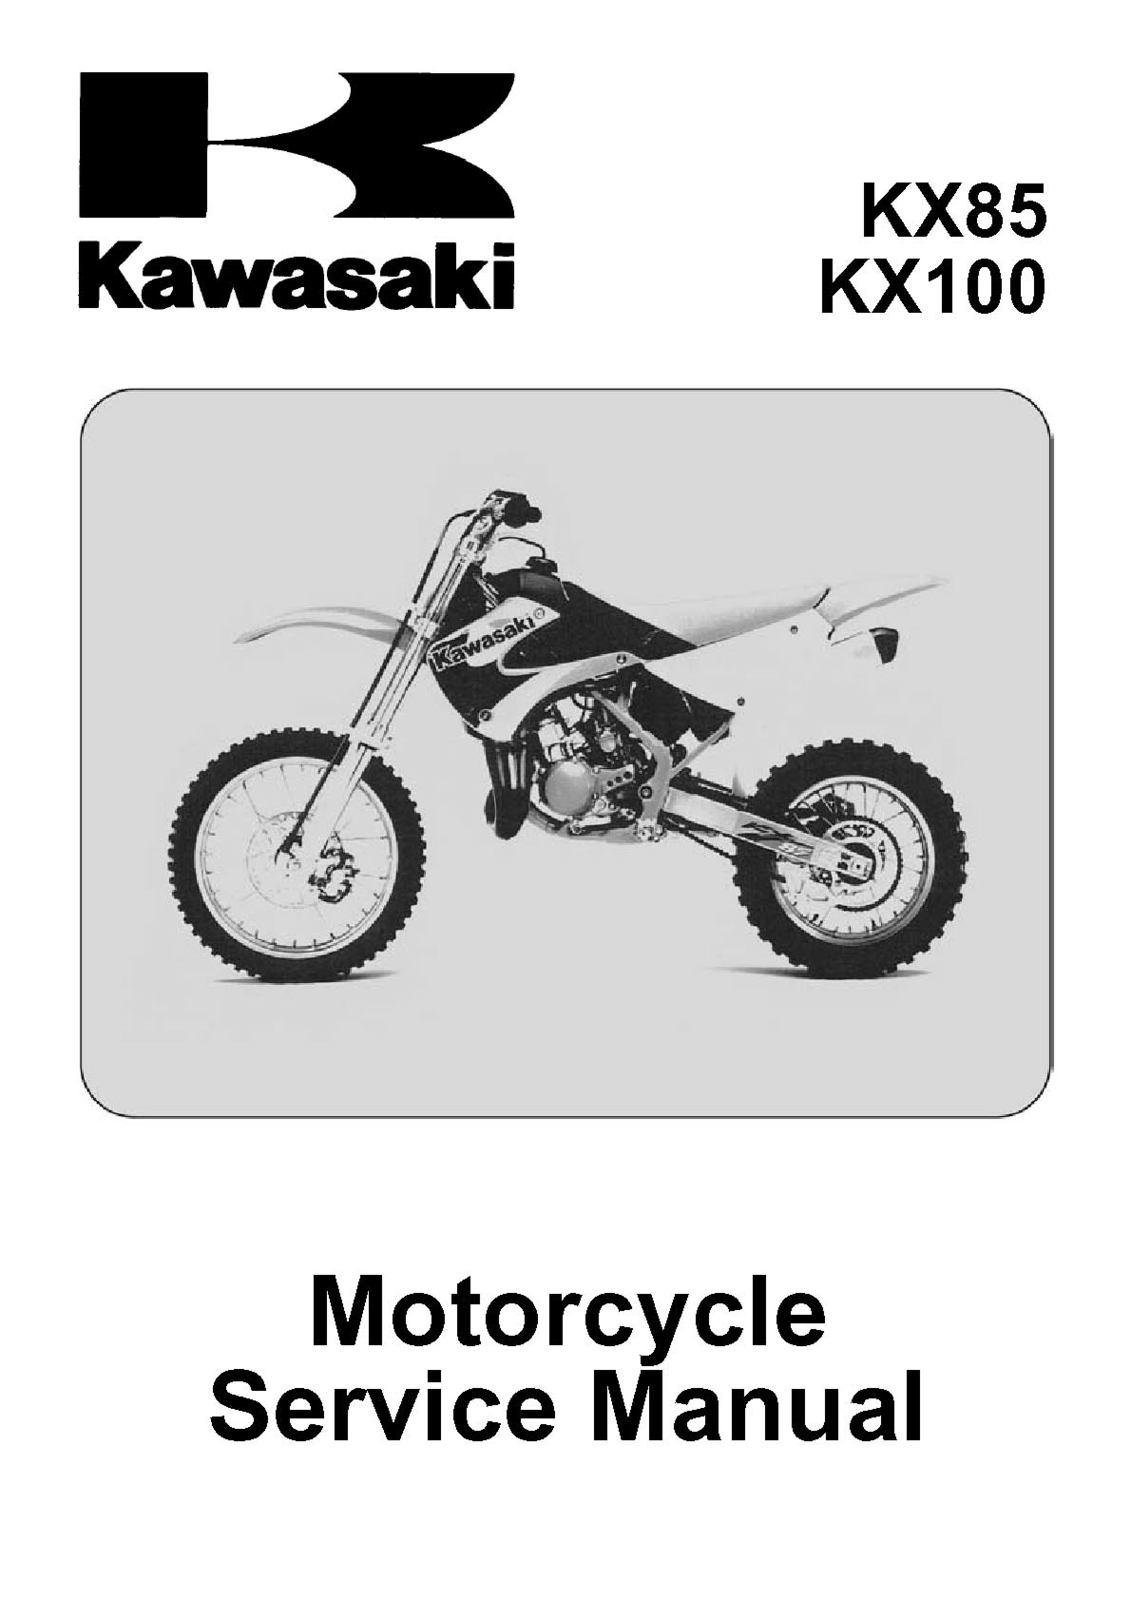 Kawasaki KX85 KX100 KX 85 100 Shop Service and 44 similar items. Kx85 kx100